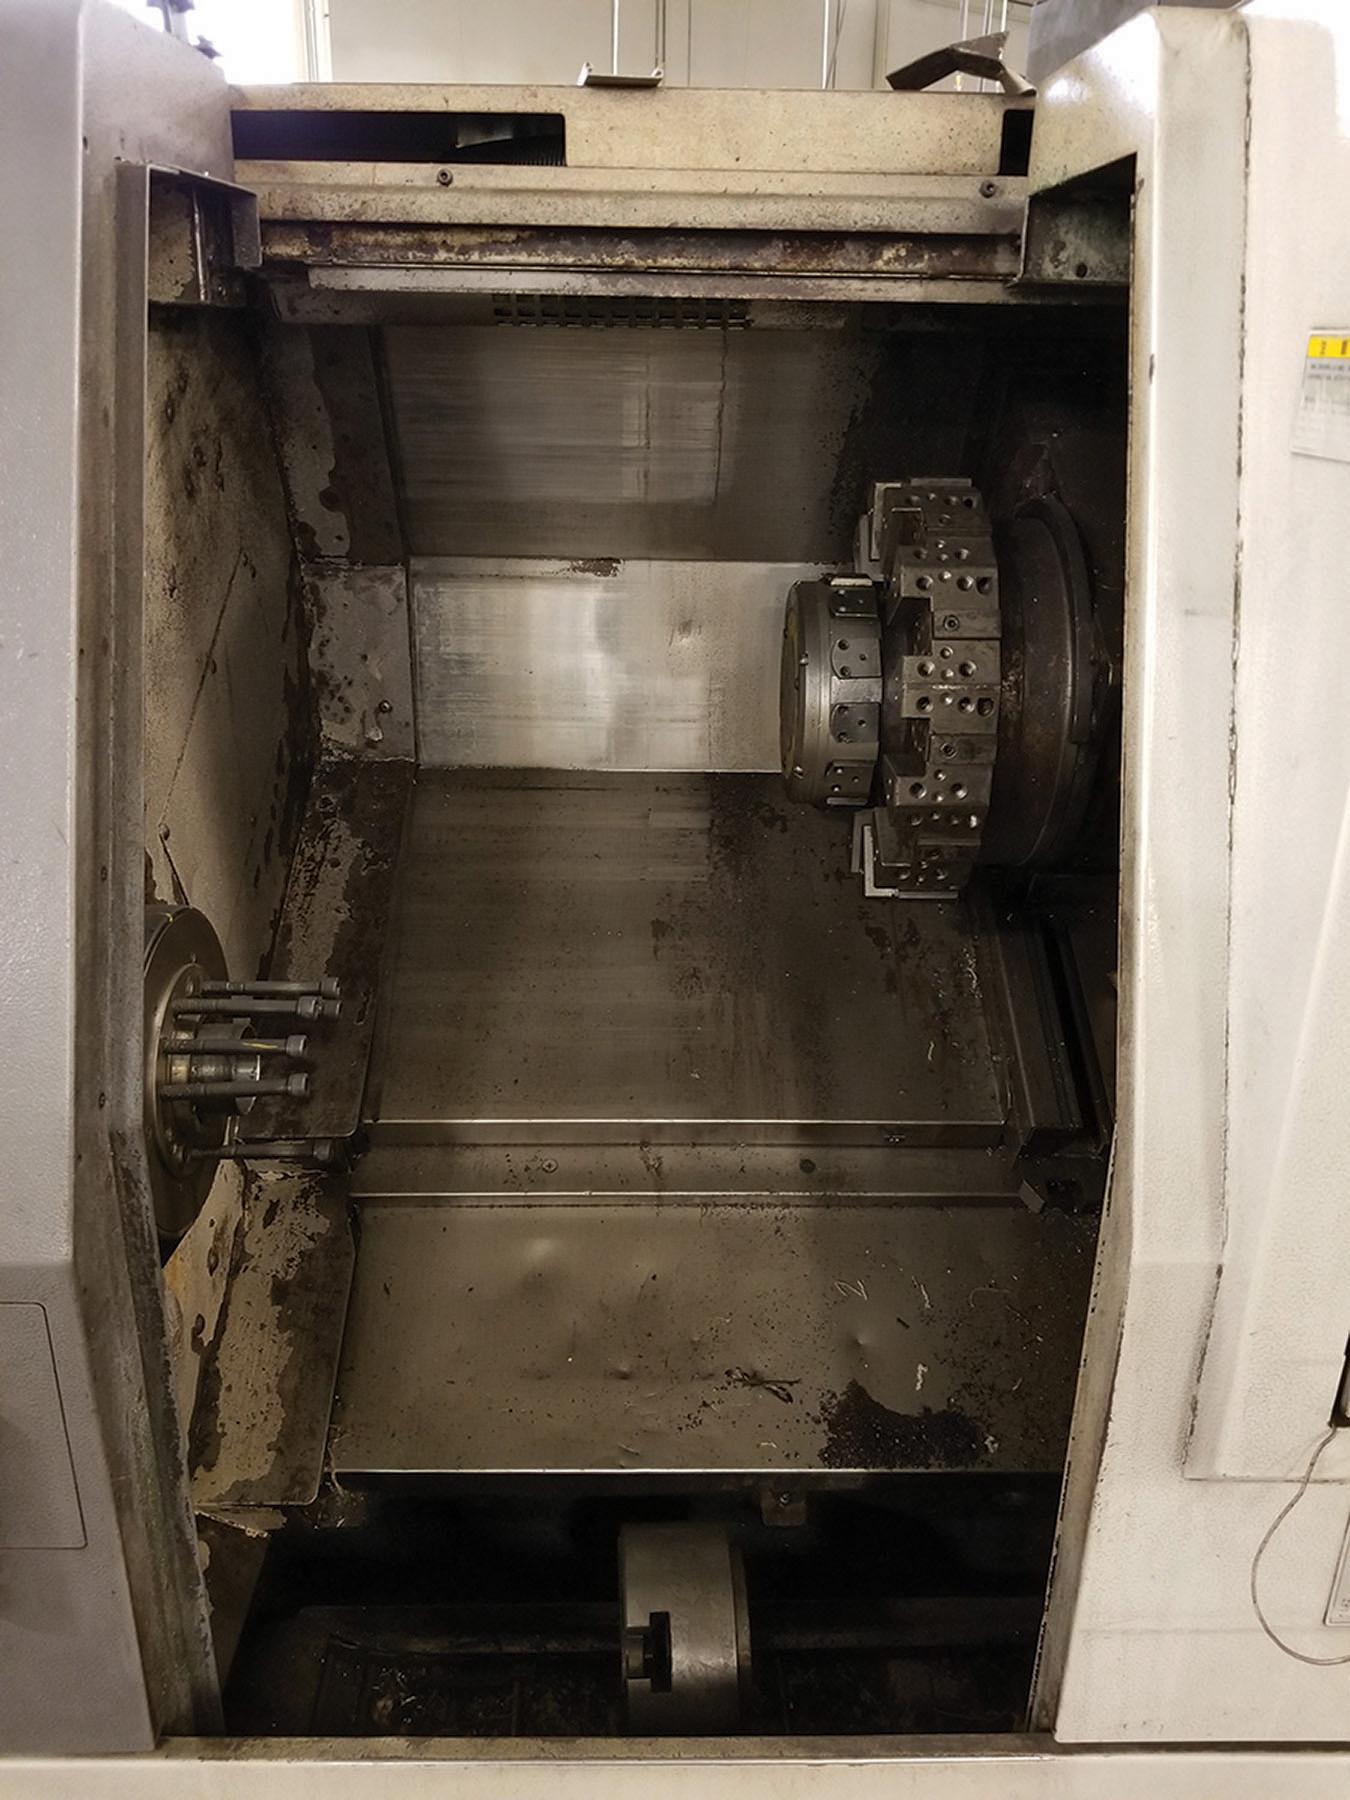 Lot 8 - 1996 MORI-SEIKI SL-204MC CNC LATHE, S/N SL200AK1531, 10-HEAD HORIZONTAL TURRET CHUCK, 12-TURRET